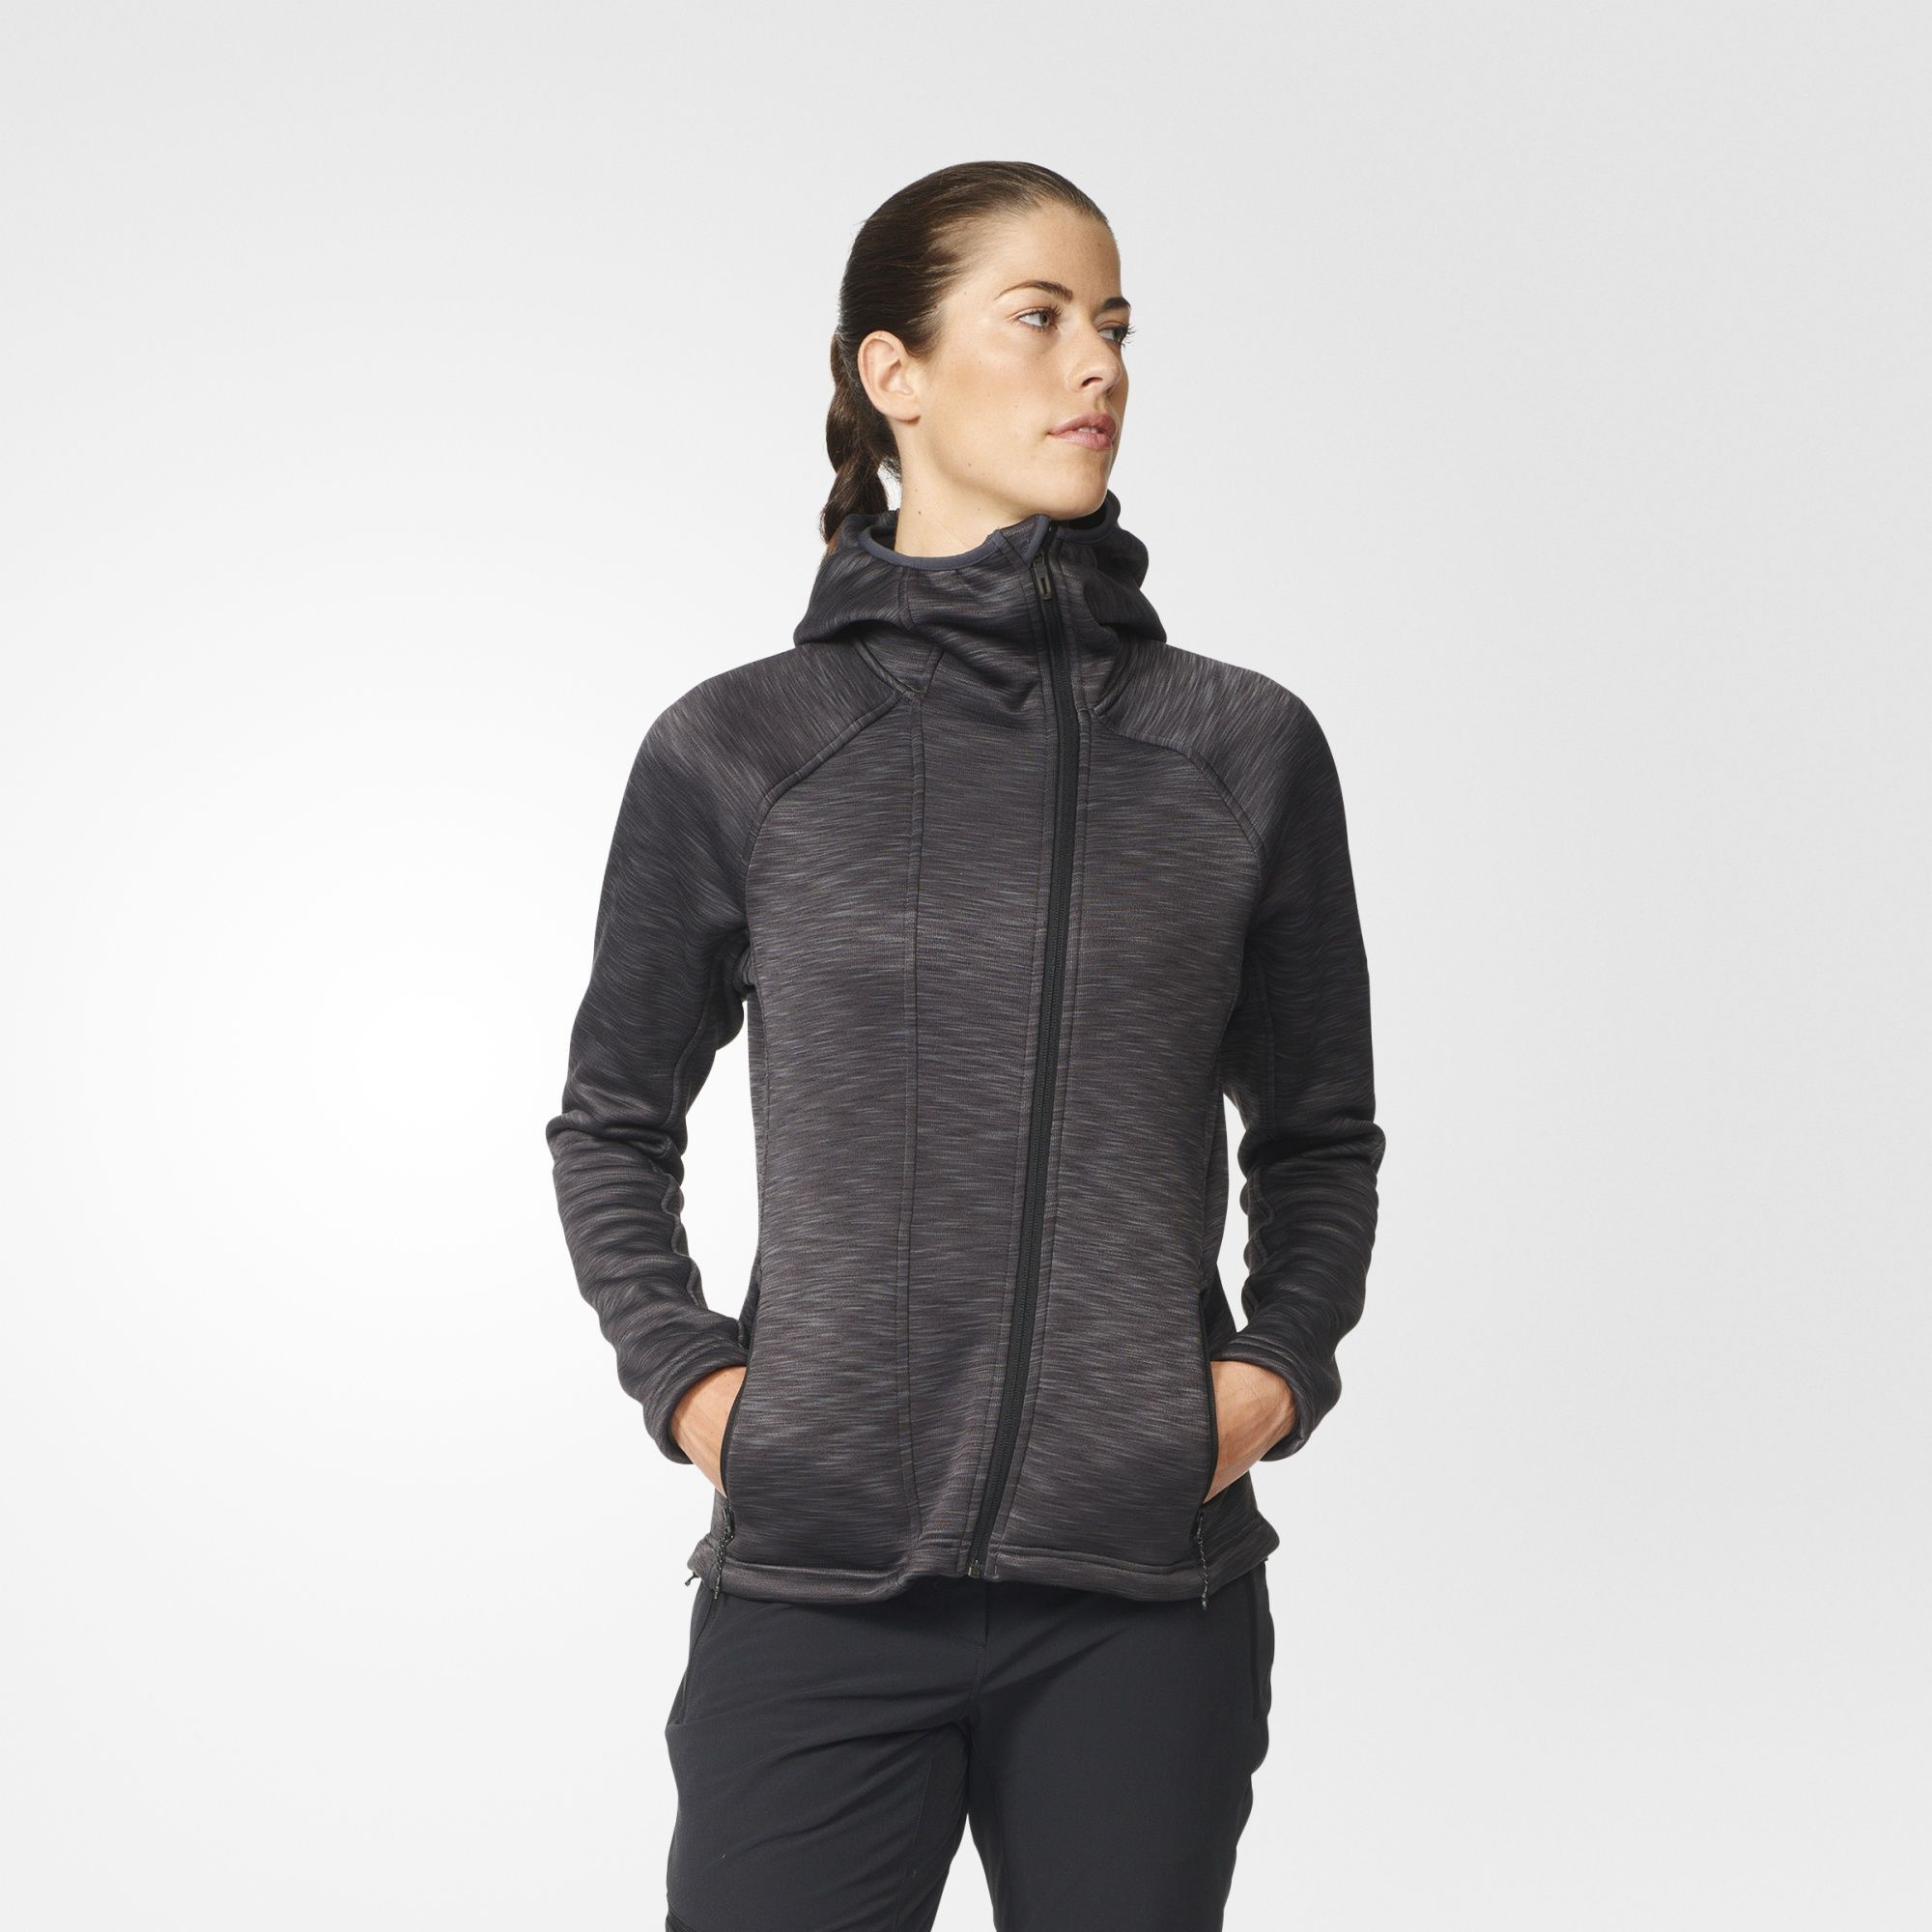 Predownload: Adidas Climaheat Hooded Fleece Jacket Women Hoodies Sweatshirts Hoodies Hoodies Womens [ 2000 x 2000 Pixel ]